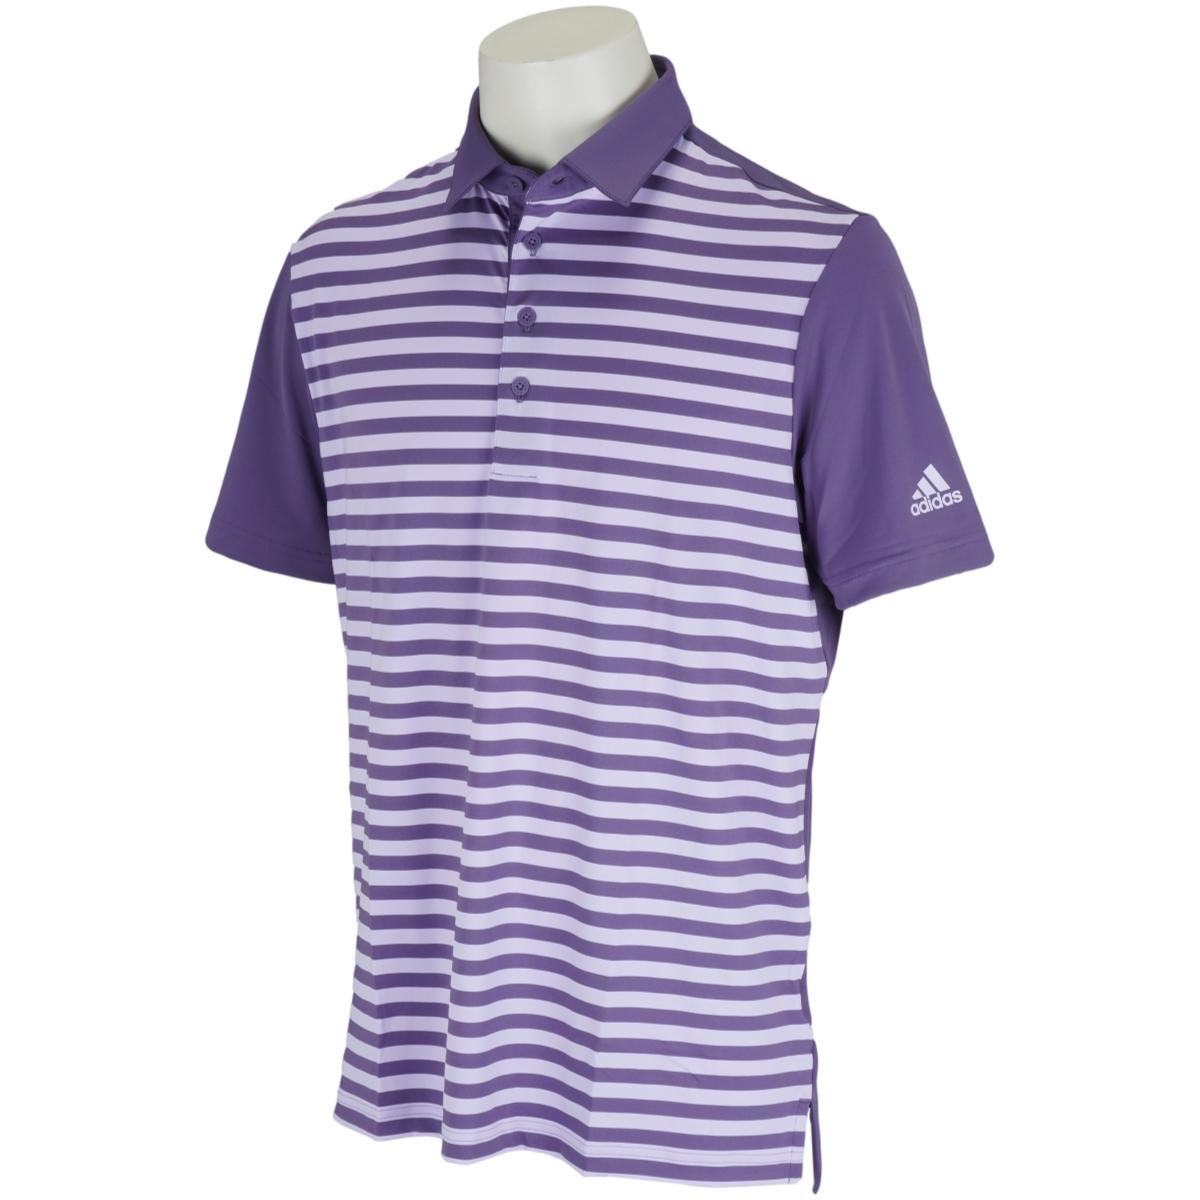 ULTIMATE365 ストライプ 半袖ポロシャツ